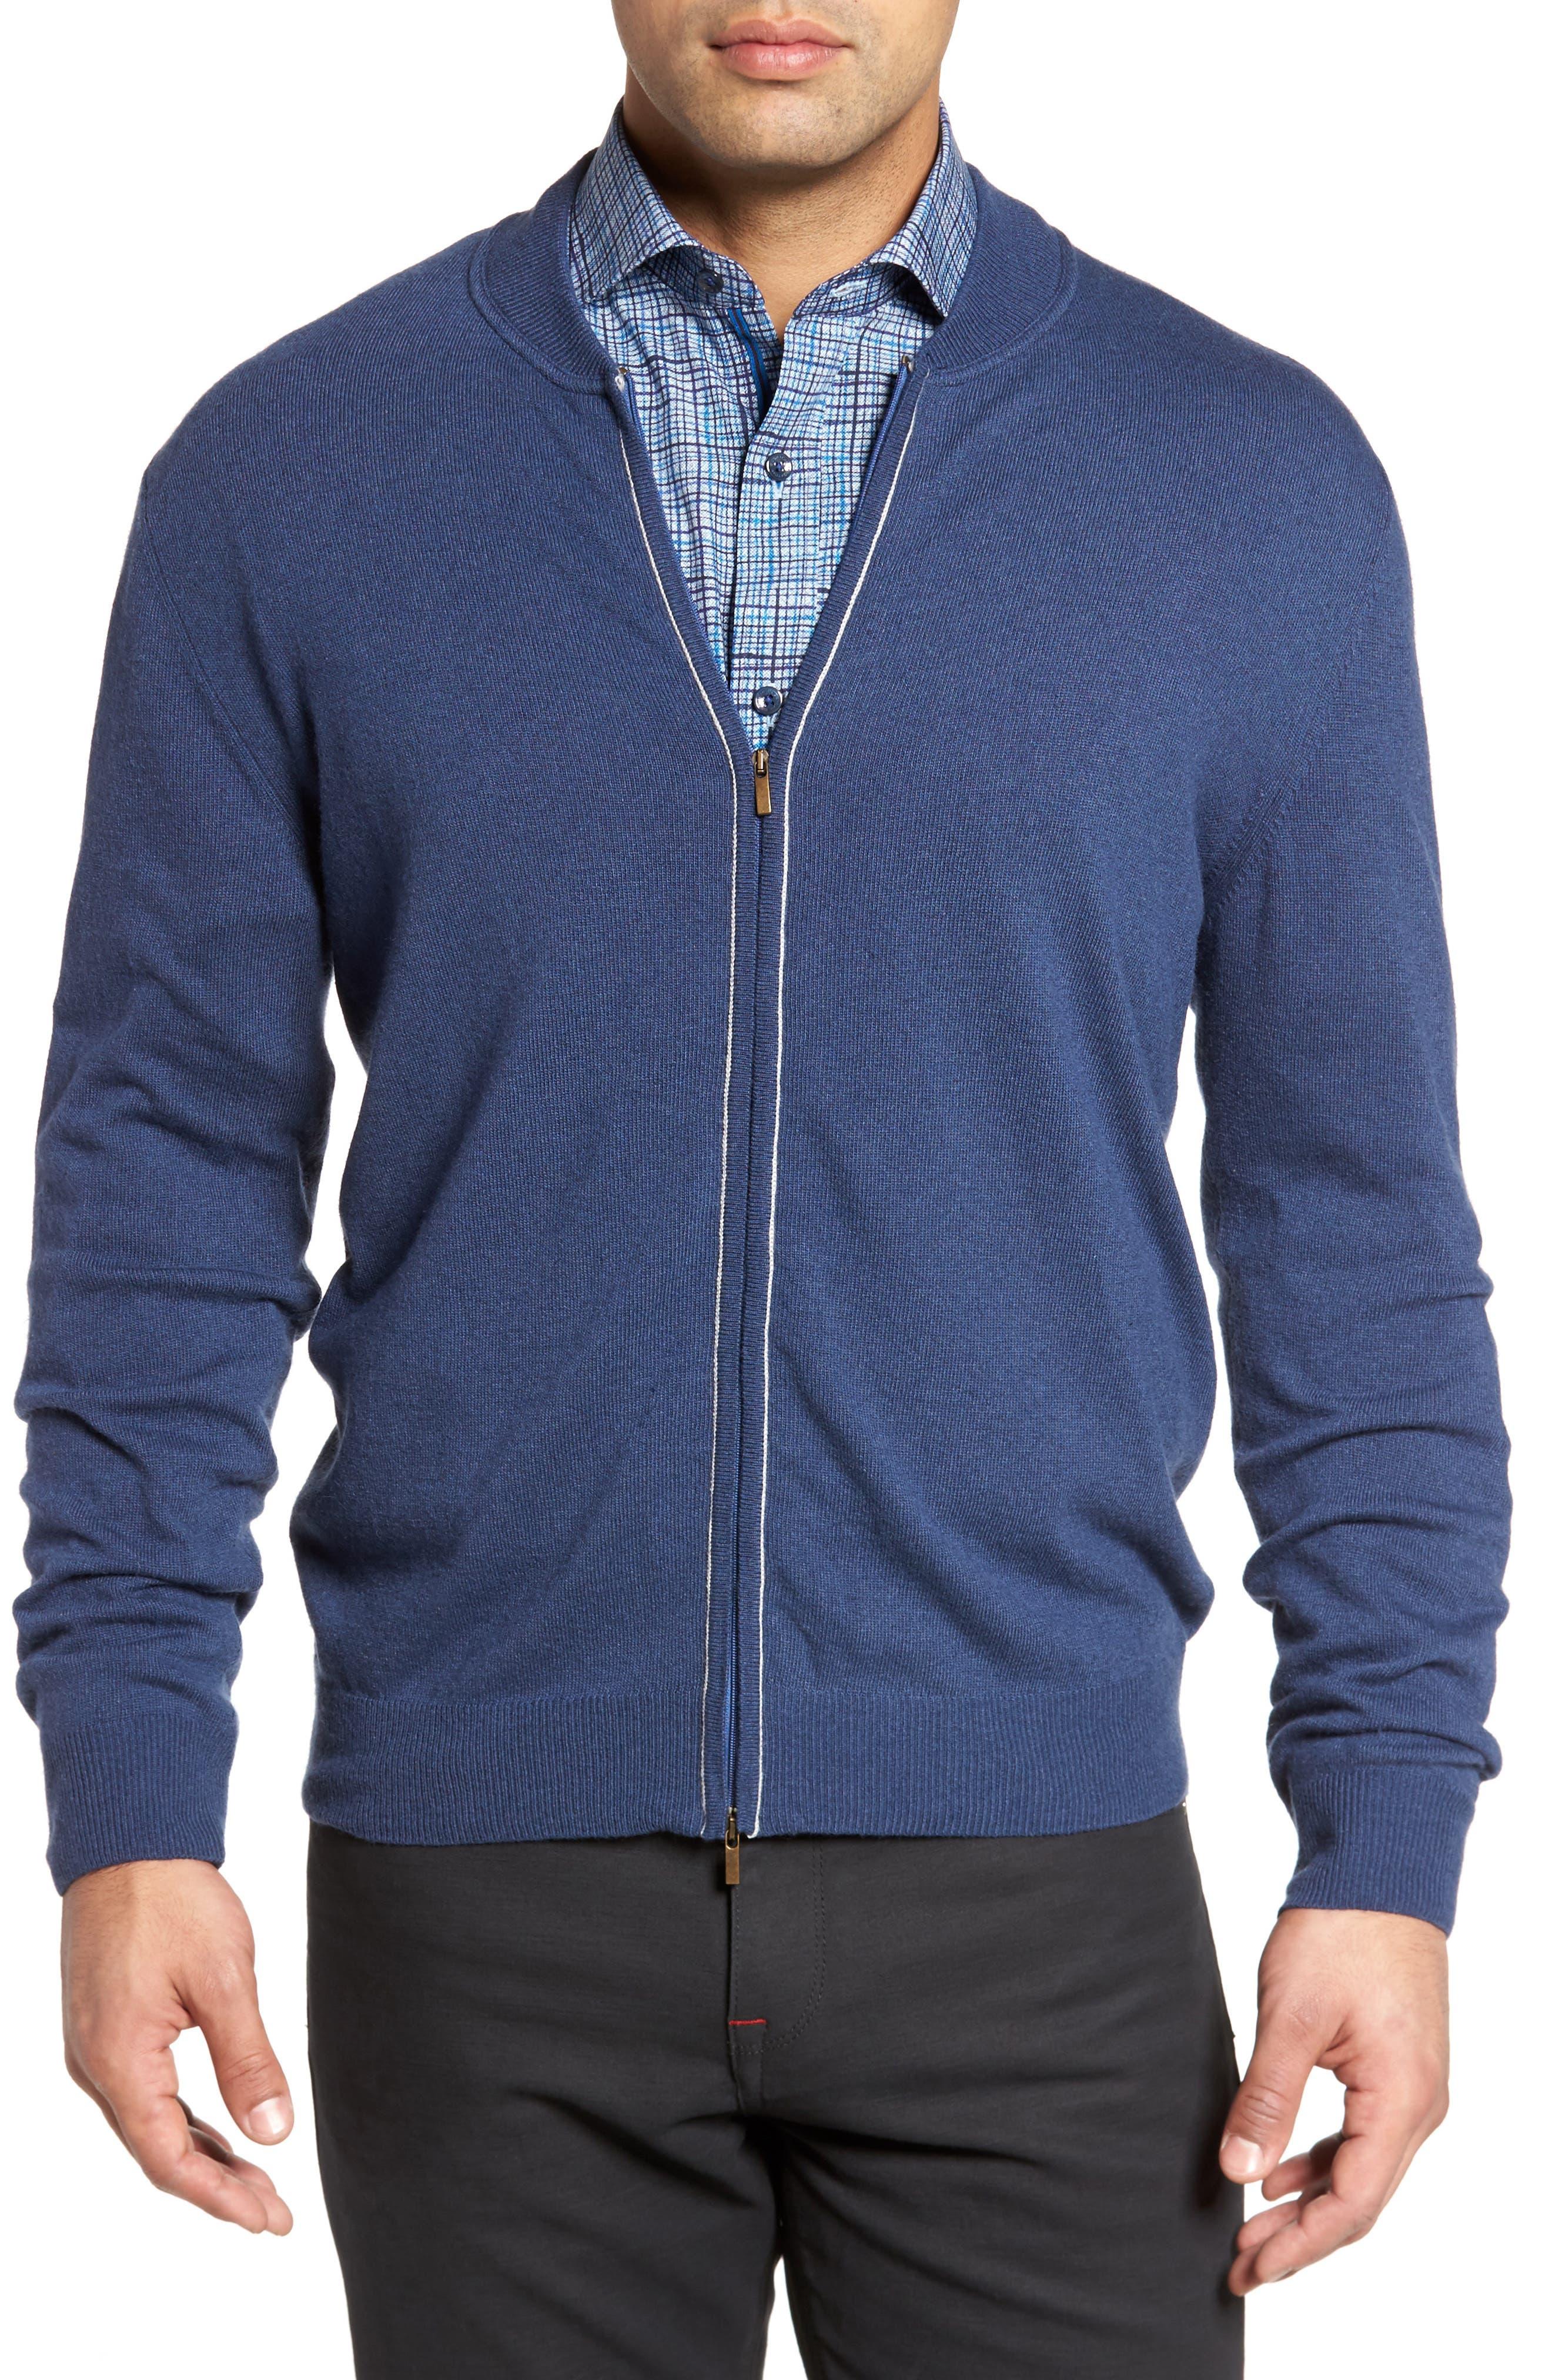 Alternate Image 1 Selected - Bugatchi Zip Sweater